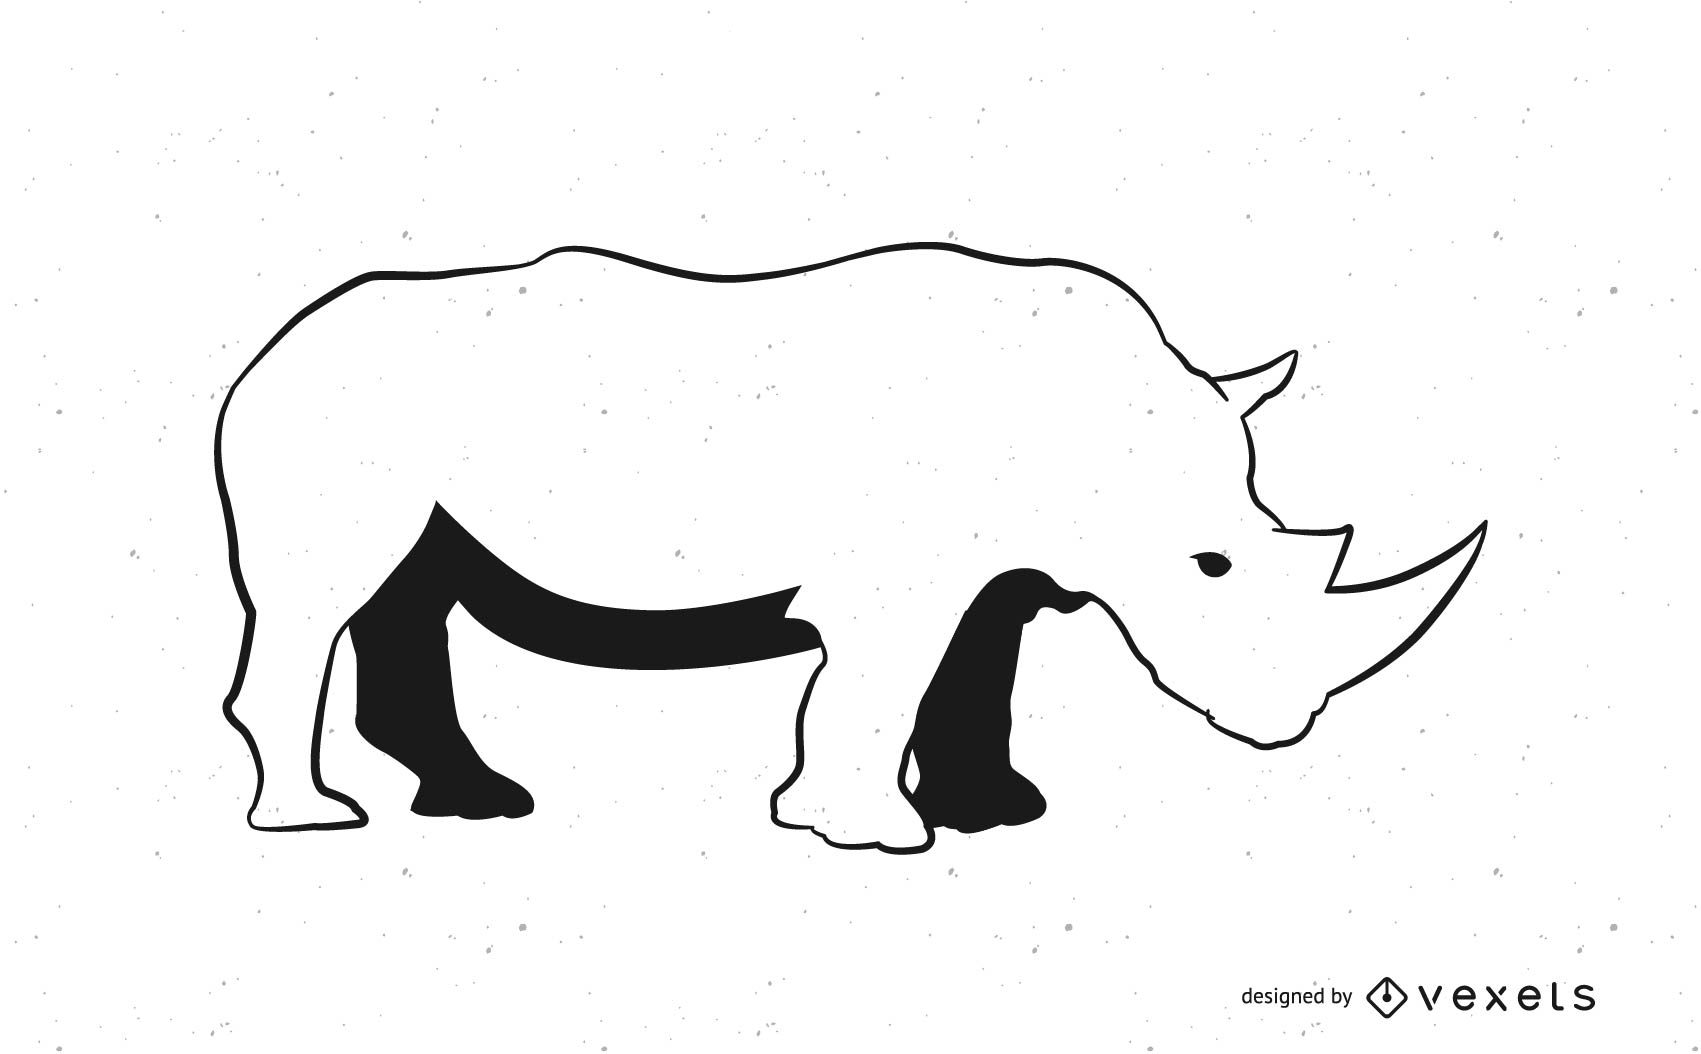 Line Art Black & White Rhino